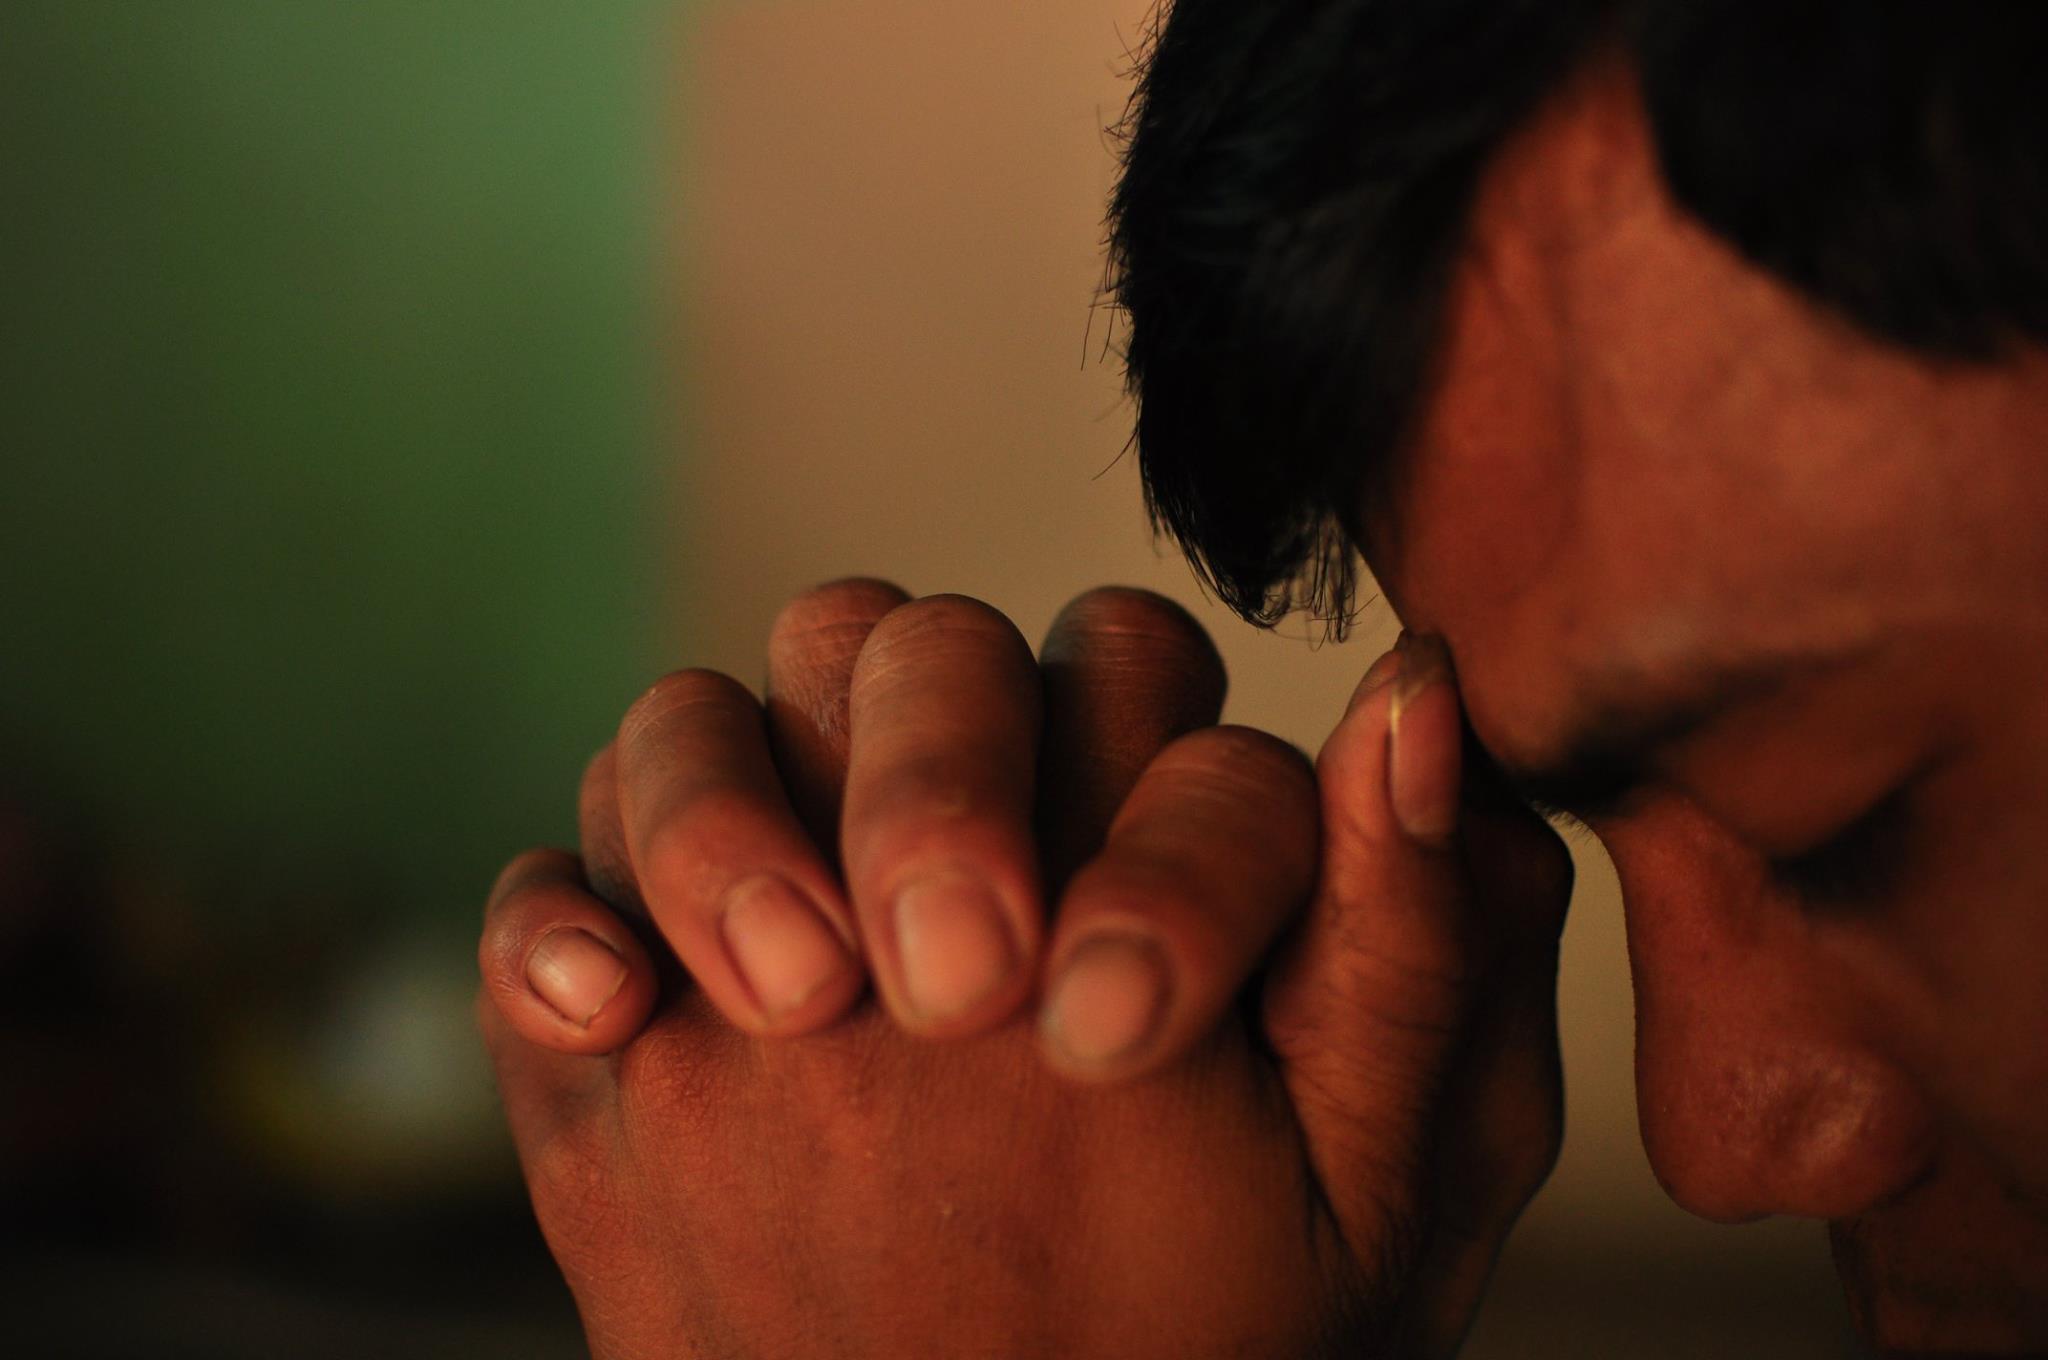 Pakistan law adds pressure on religious minorities